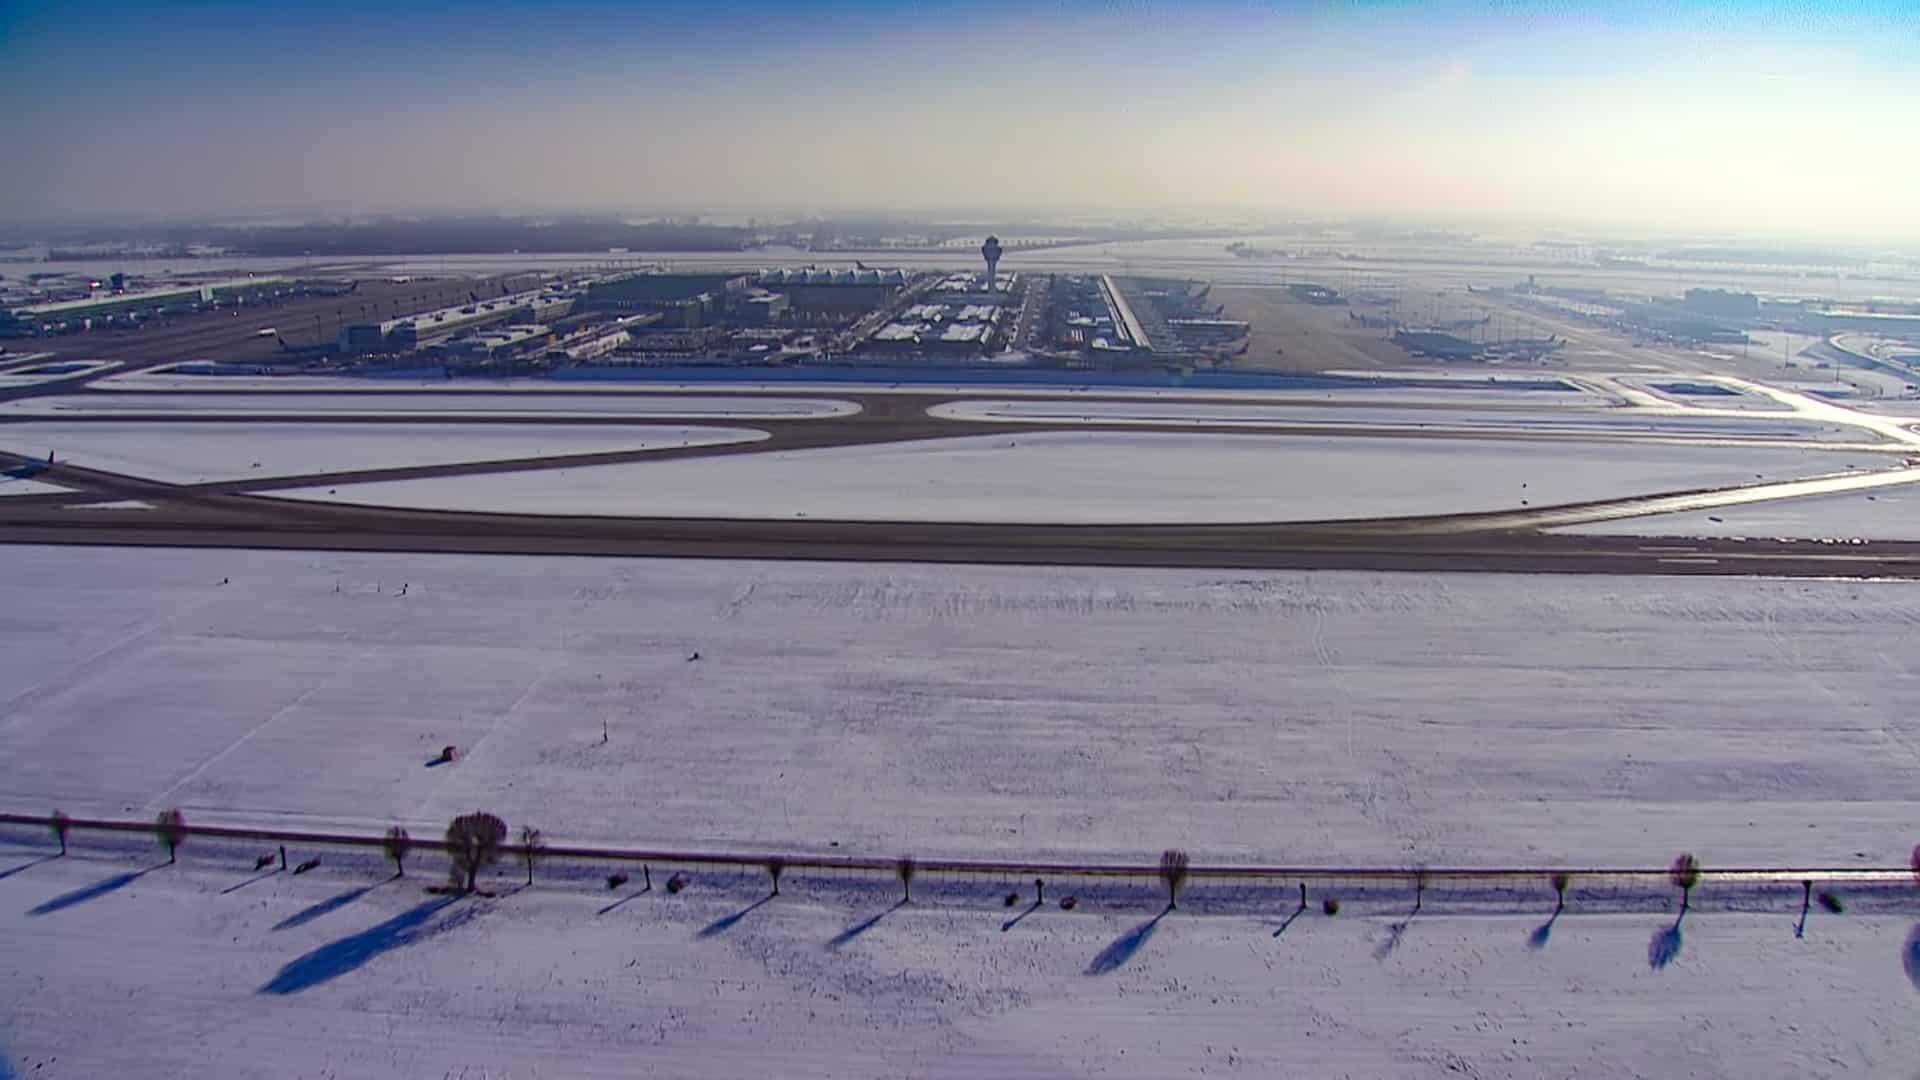 Aeroport-Munchen-iarna